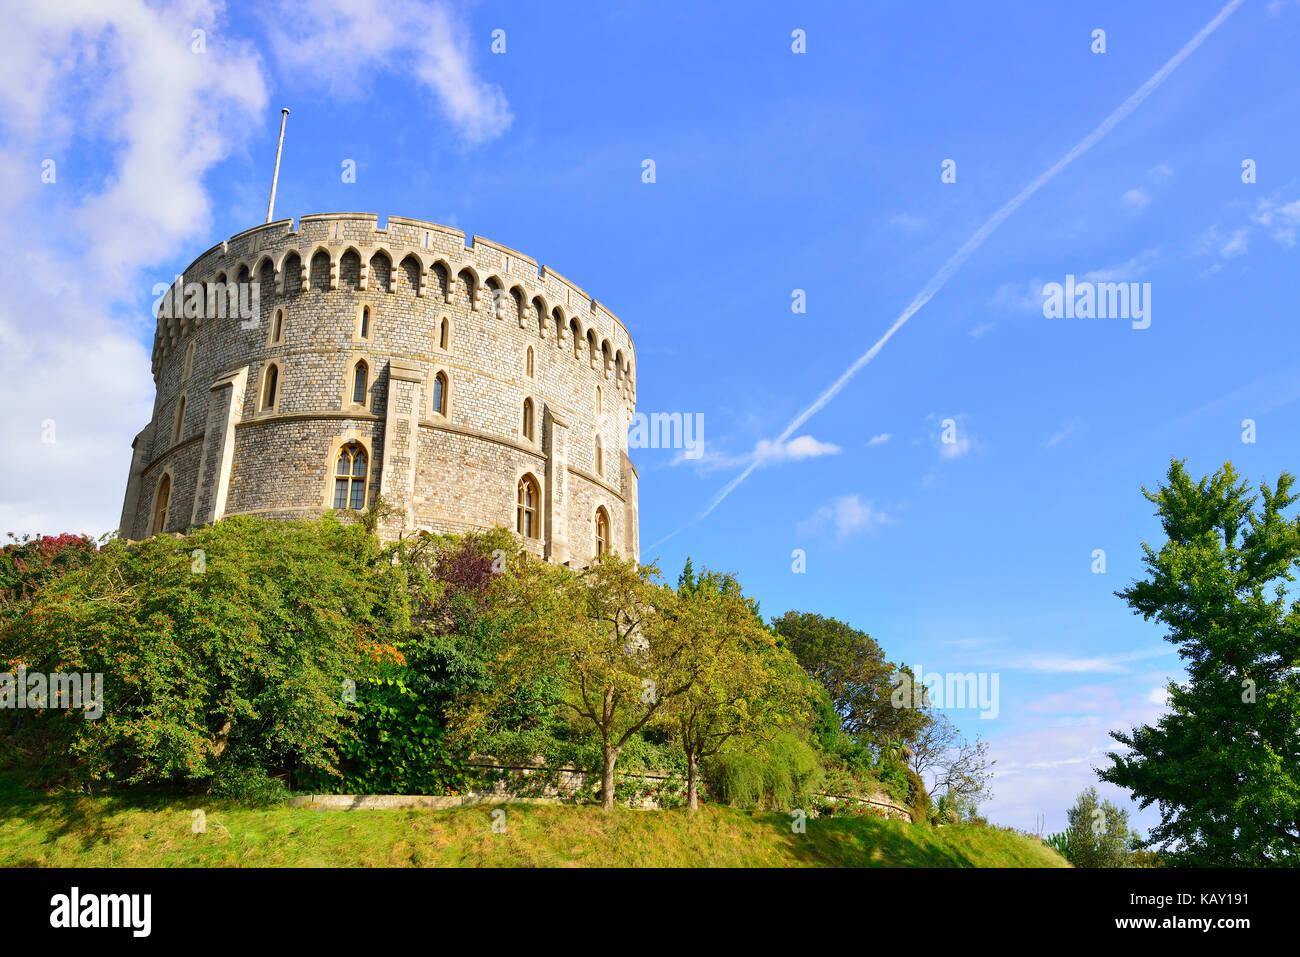 Round Tower e il fossato giardino al Castello di Windsor - Queens Royal weekend residence ,Windsor, Berksire , Inghilterra Immagini Stock